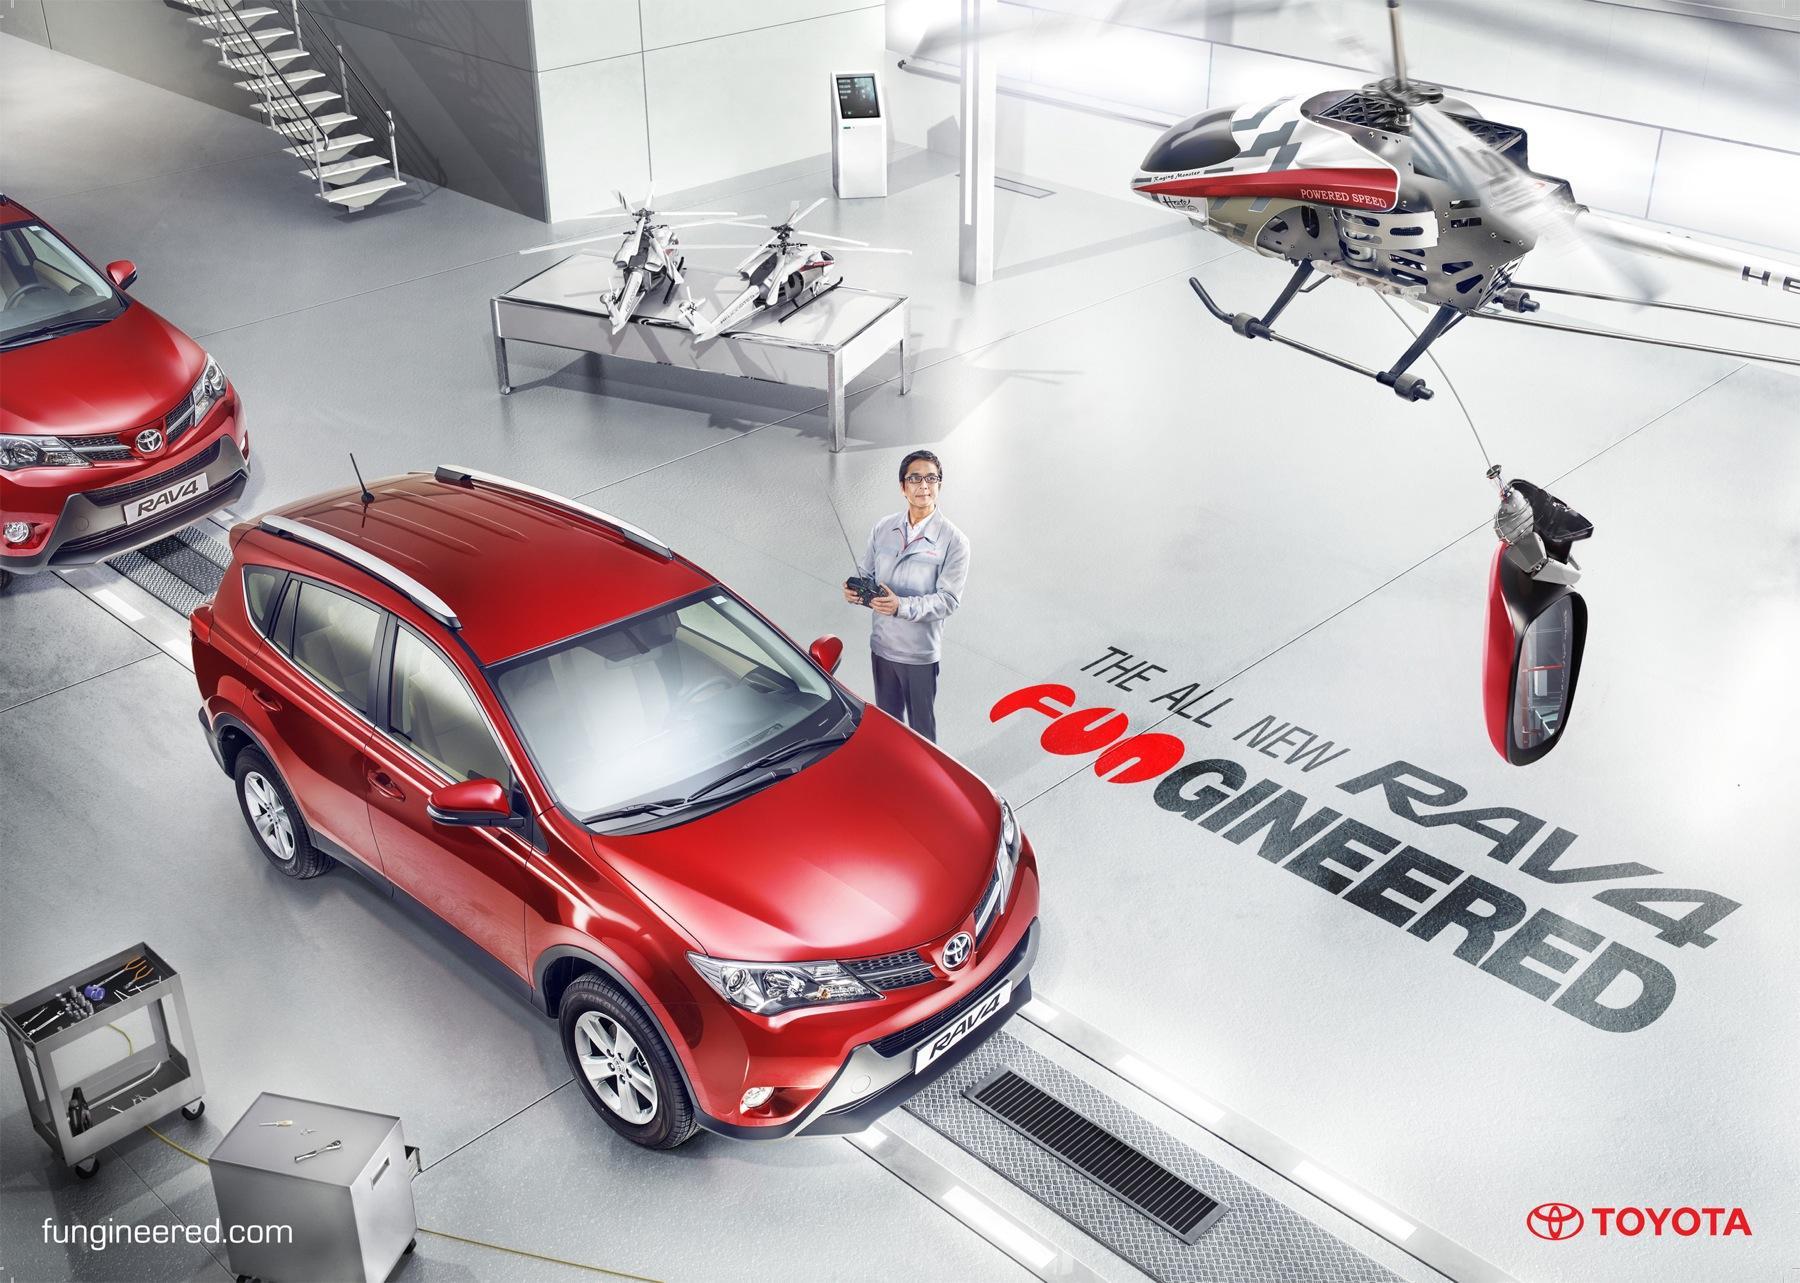 Toyota Print Ad -  Fungineered, 2